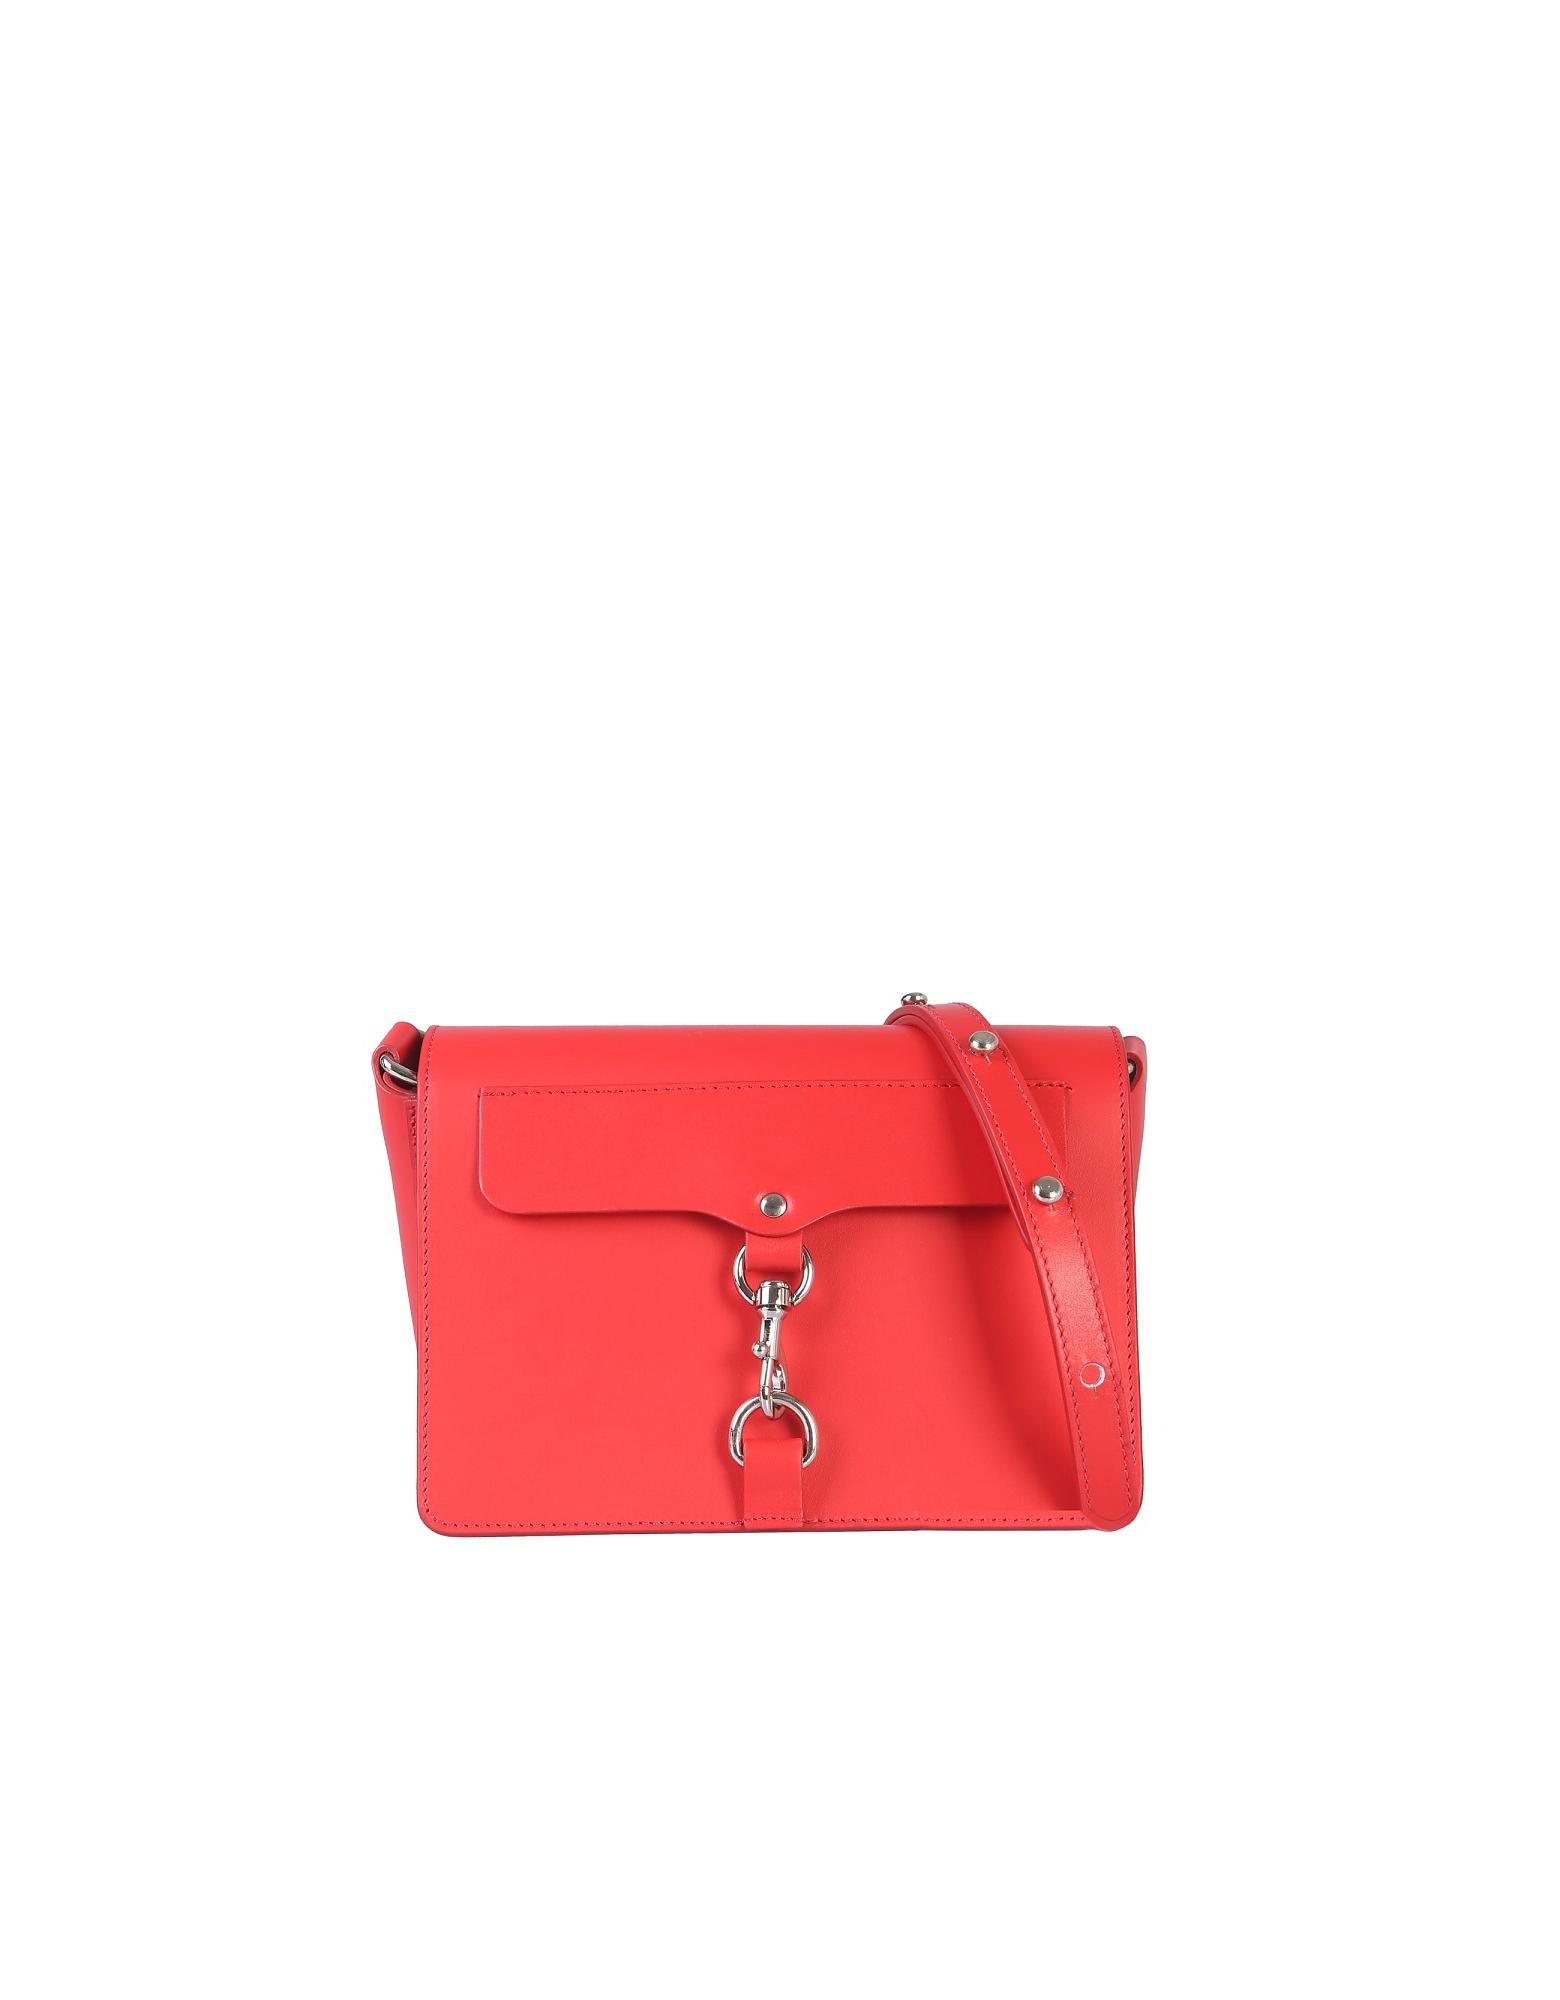 Rebecca Minkoff Designer Handbags, Mab Flap Bag